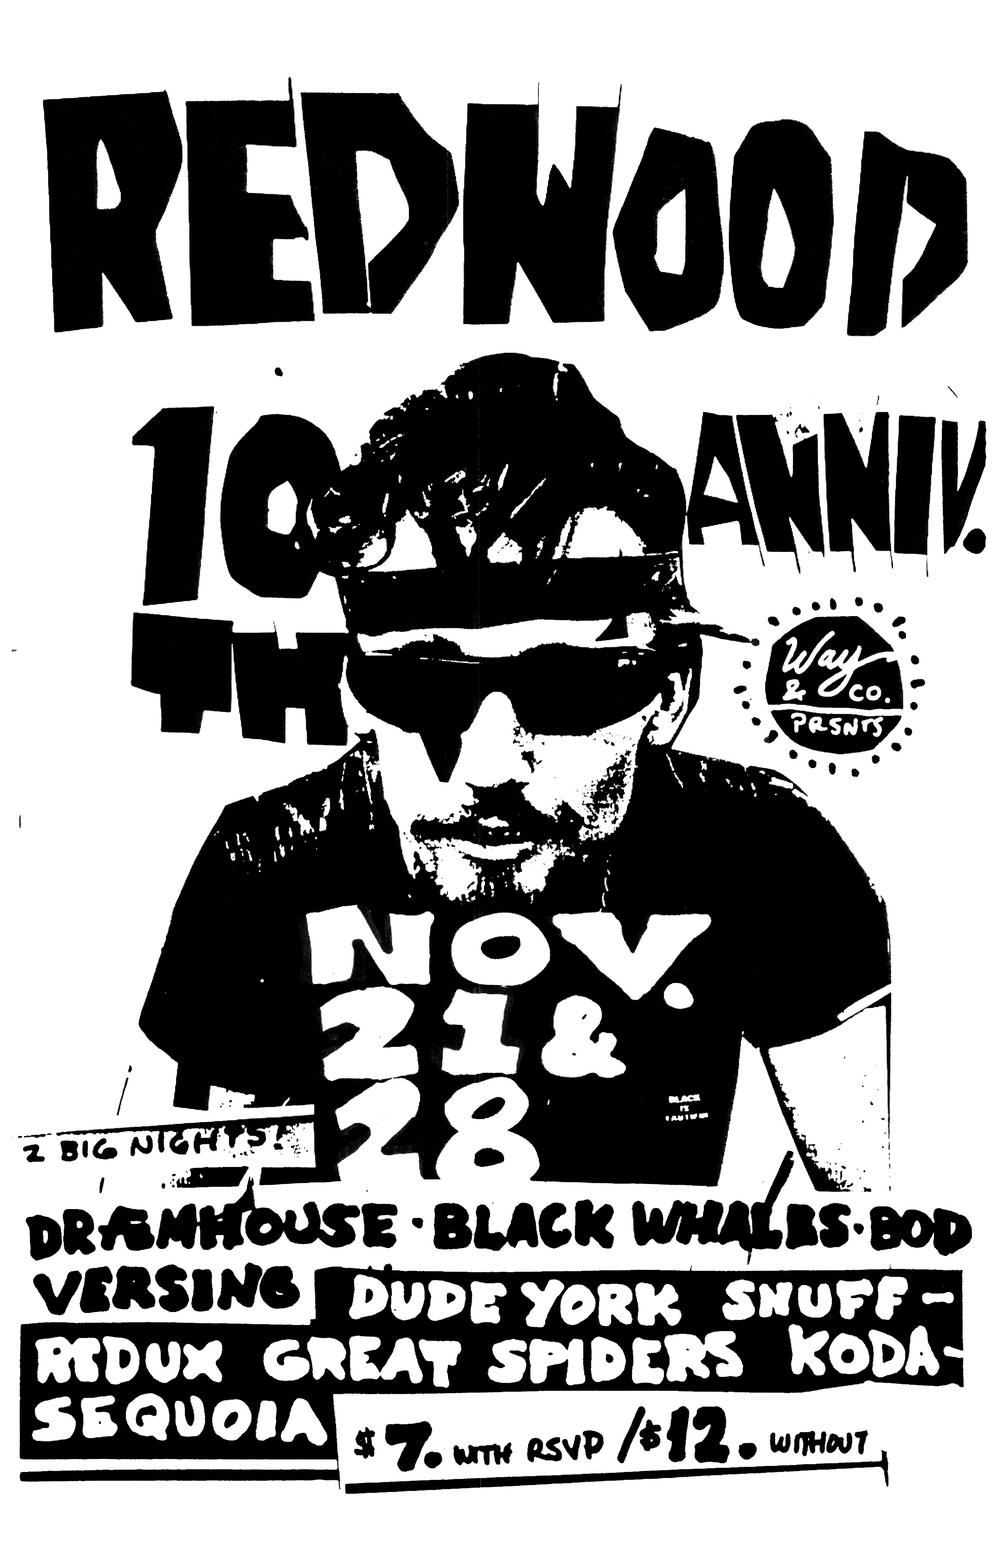 Redwood_poster by cmr.jpg